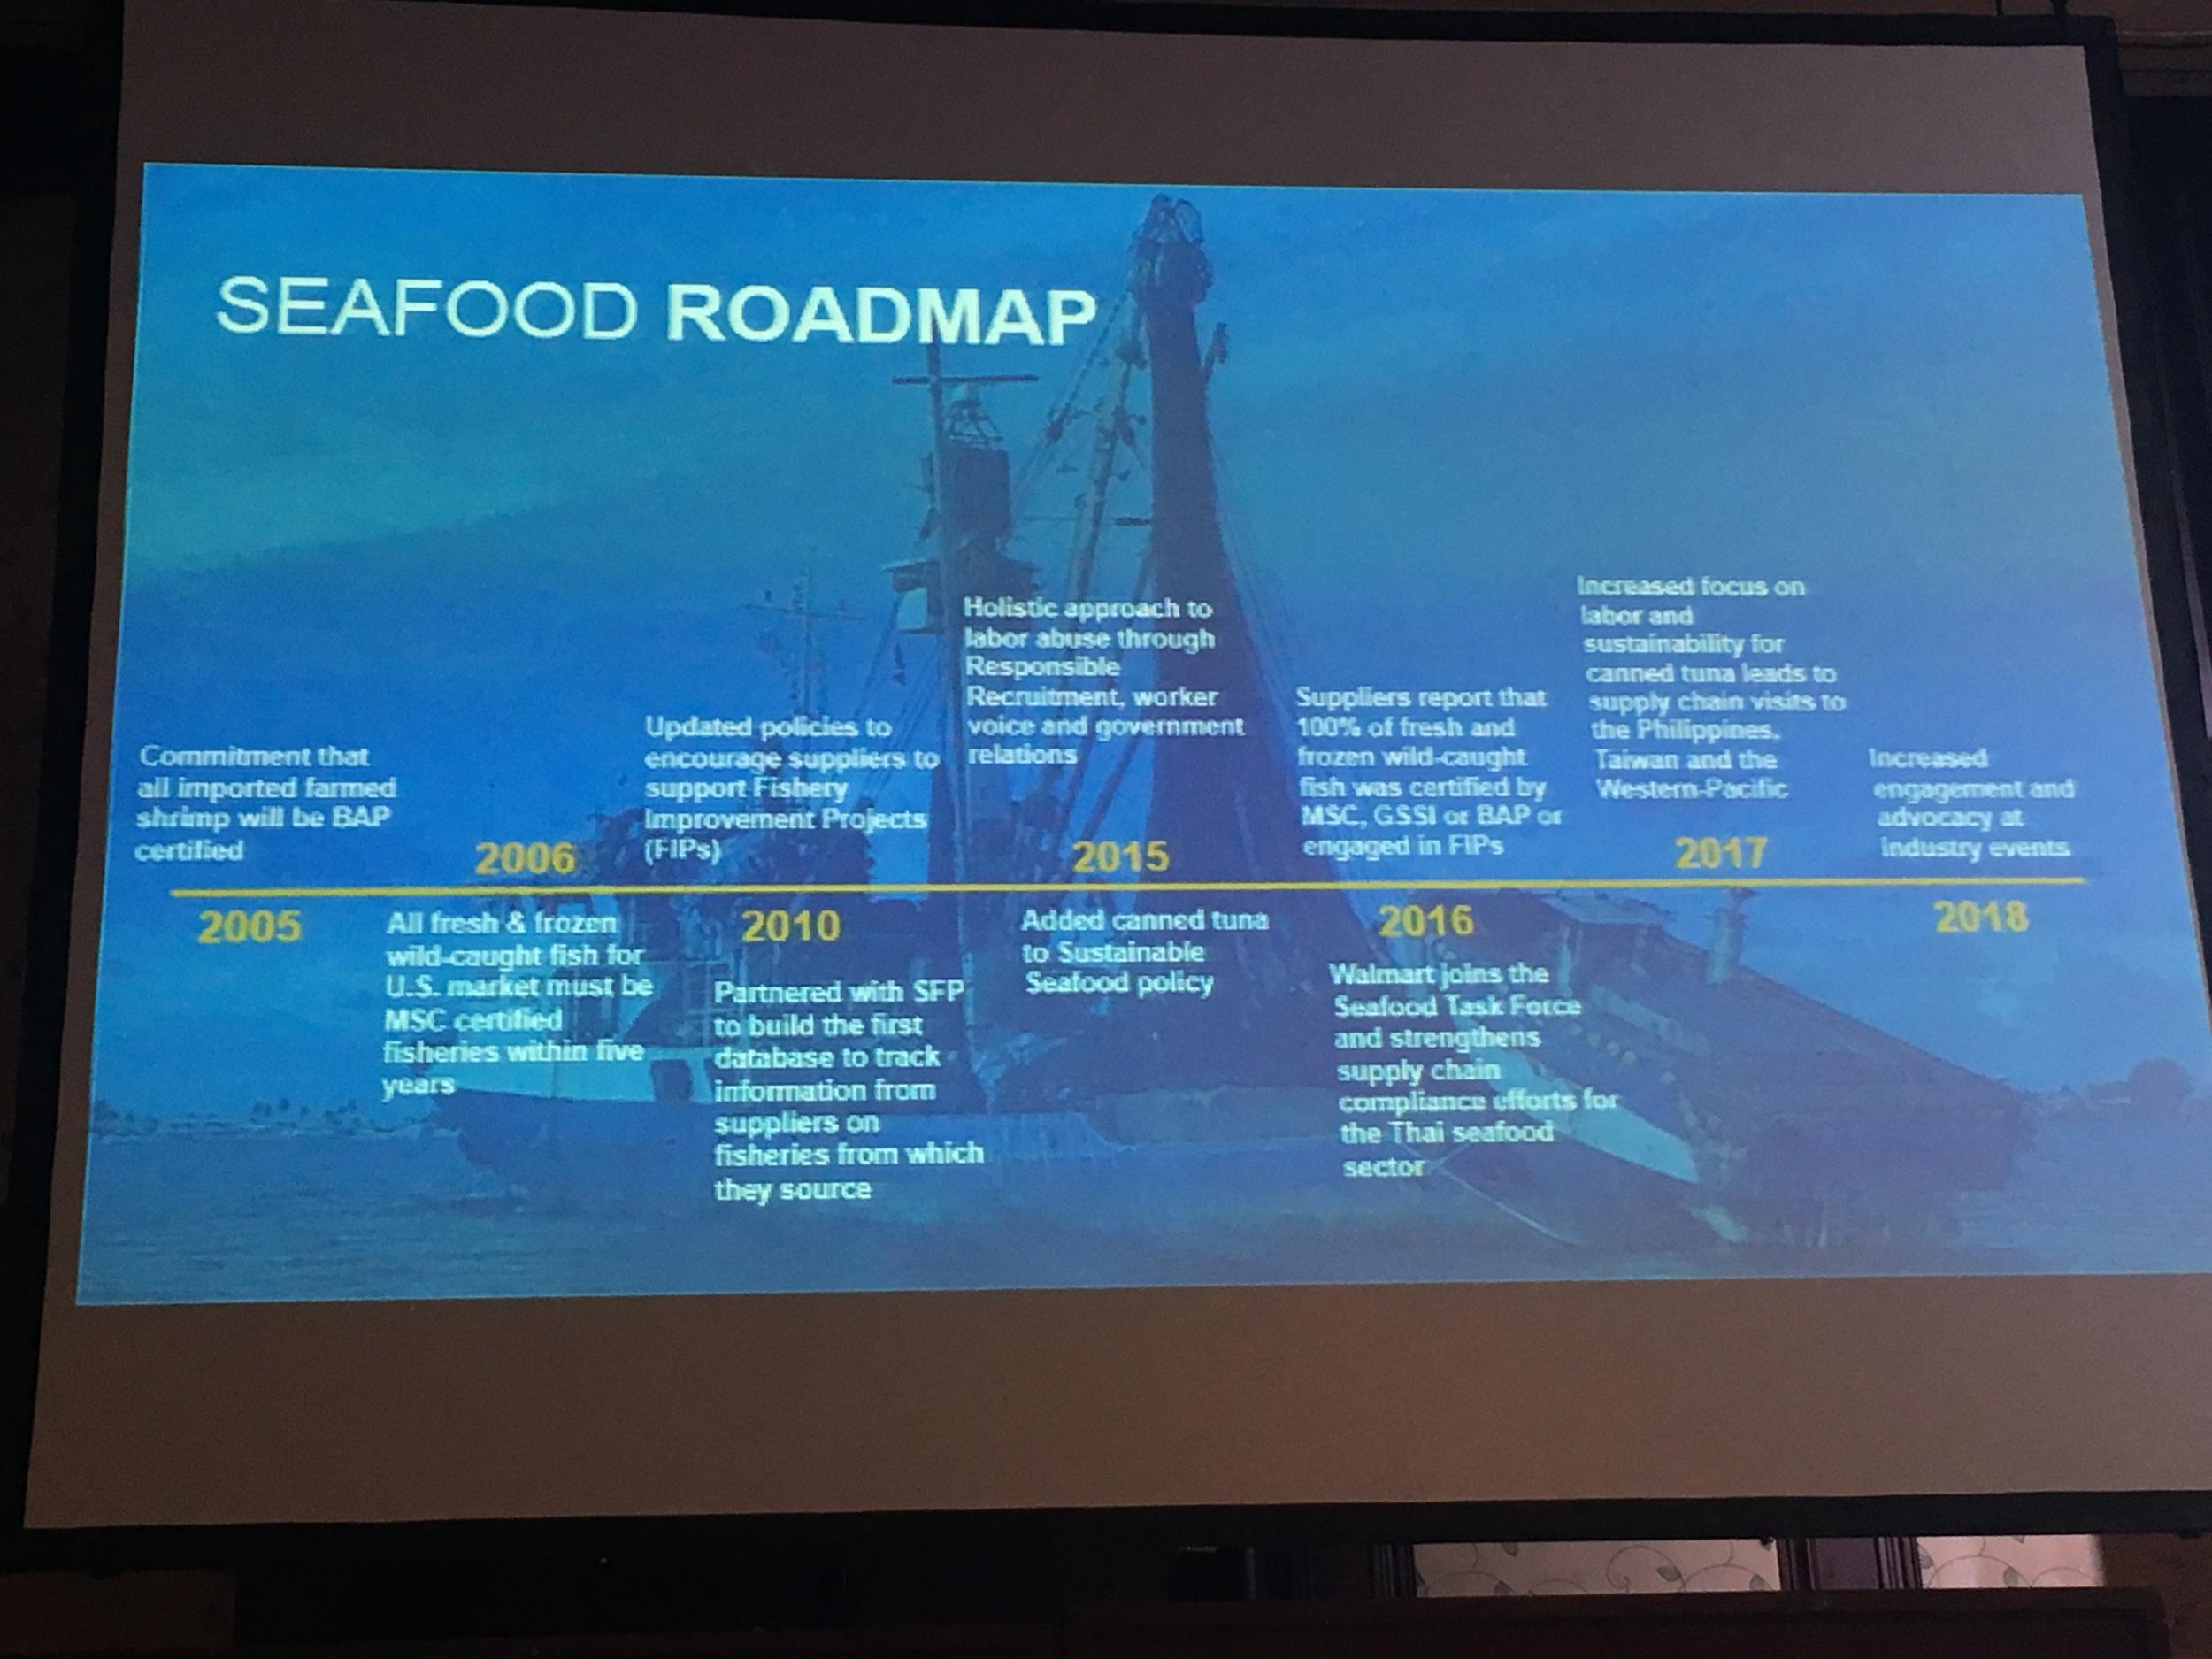 Tuna 2018: Climate change to impact tropical tuna biomass in